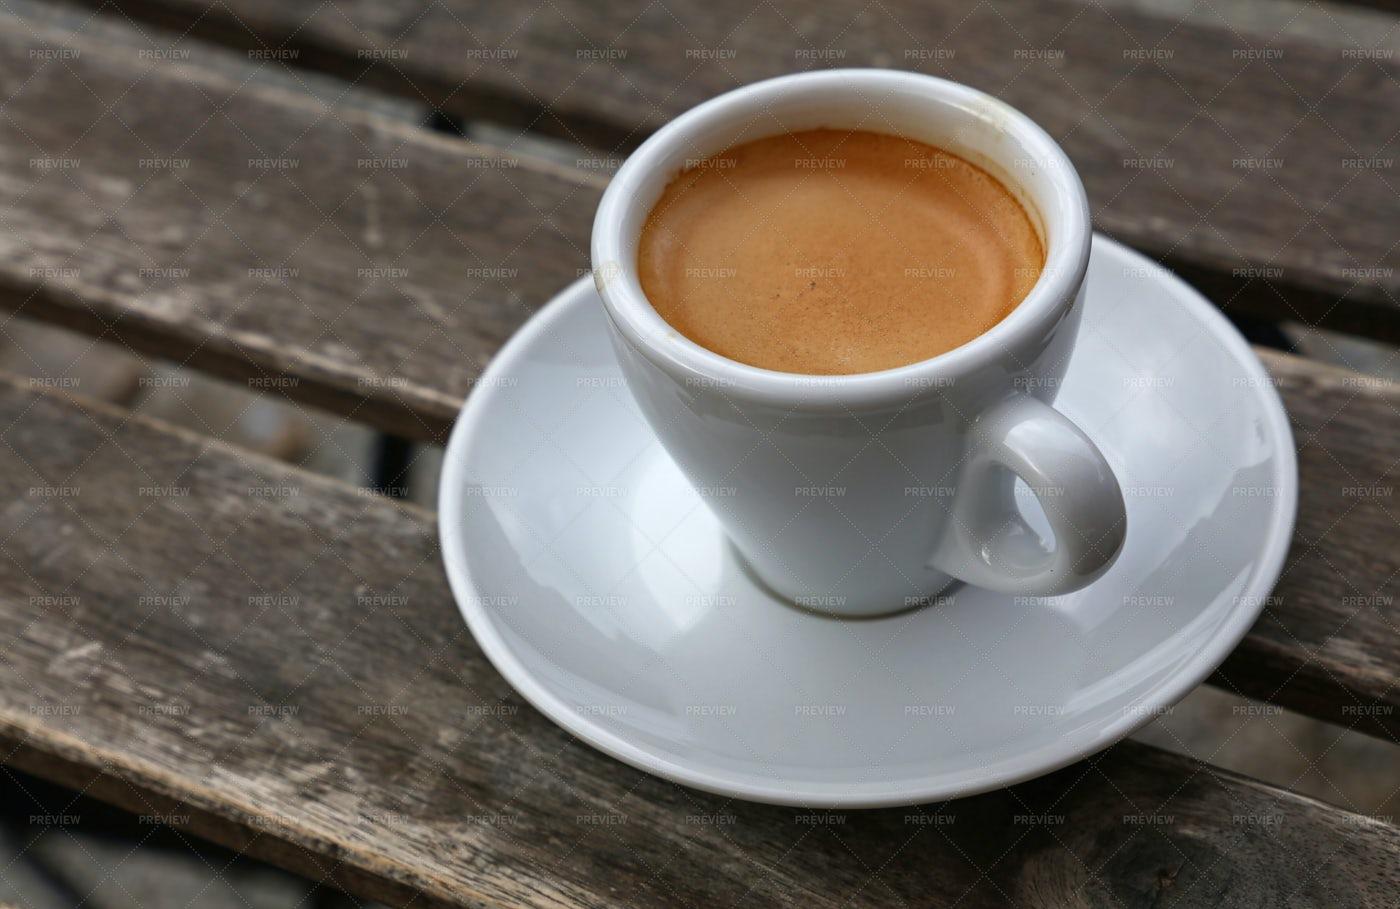 Espresso On The Table: Stock Photos